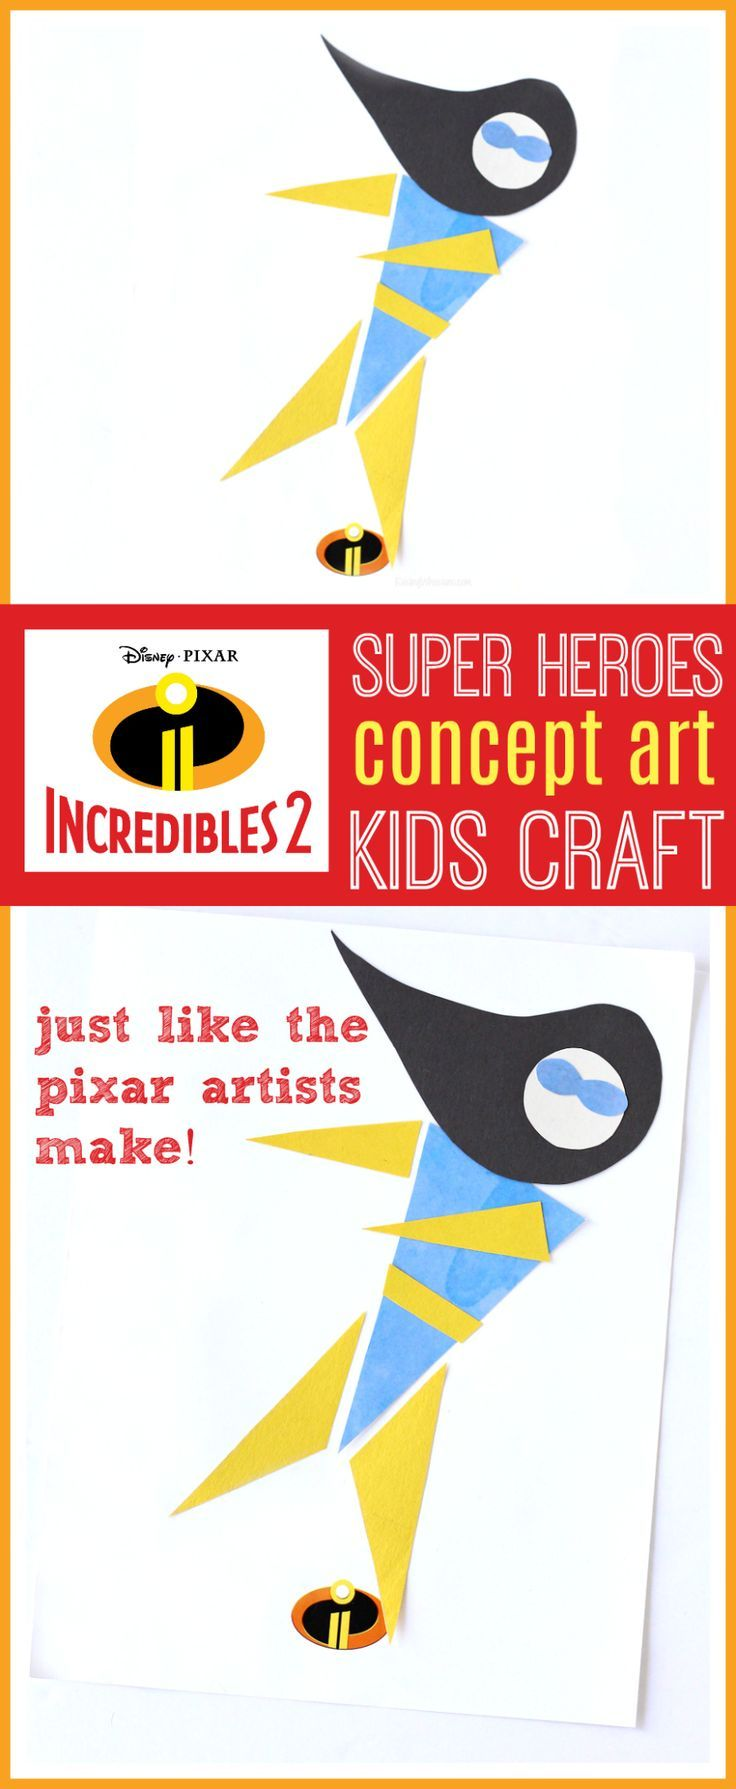 Incredibles kids craft craft ideas pinterest hero craft and